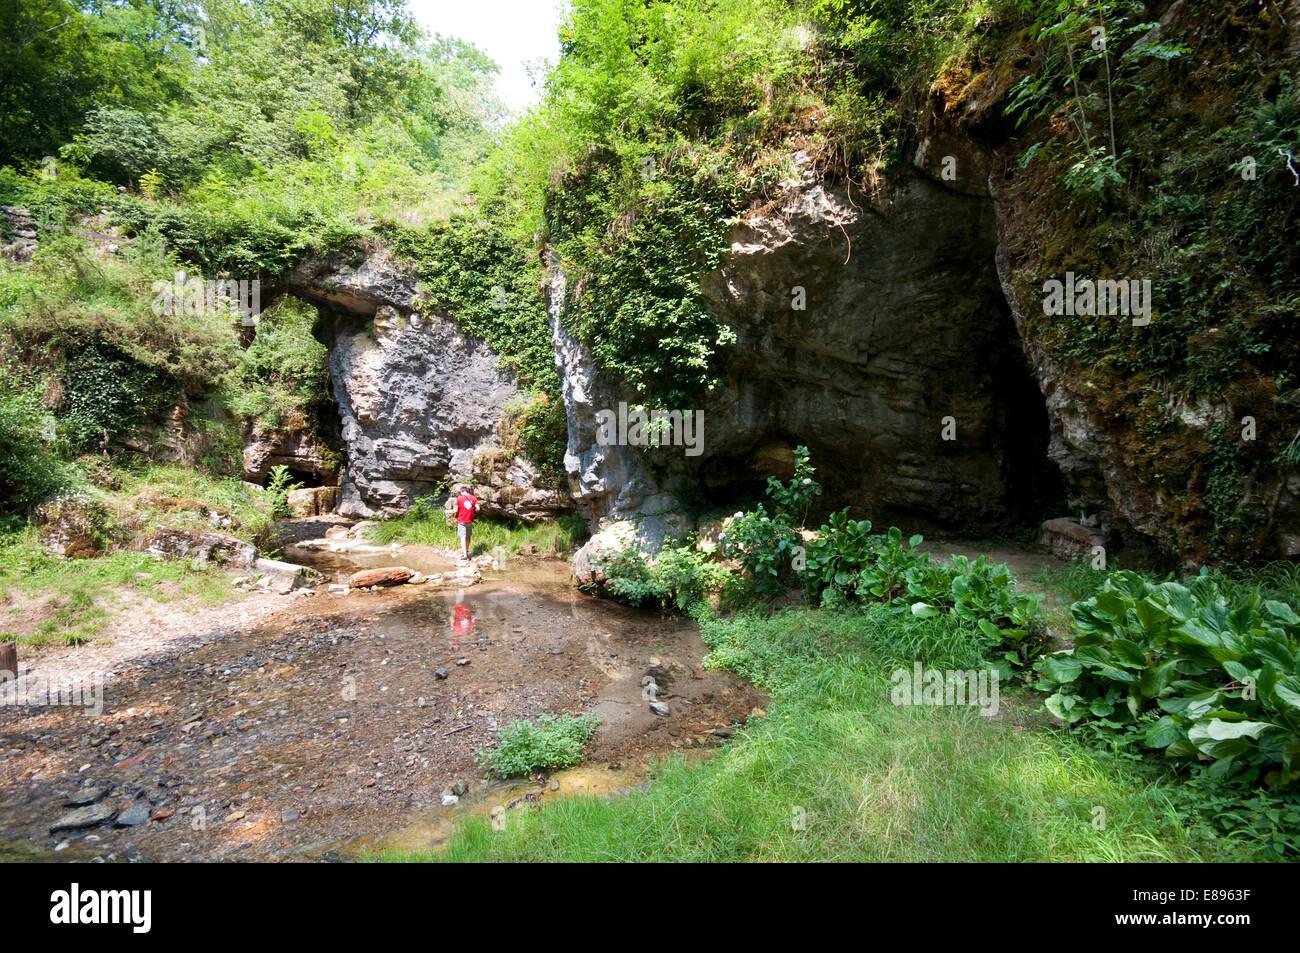 Italy, Piedmont, Ara, Grotte di Ara, Caves Ara - Stock Image